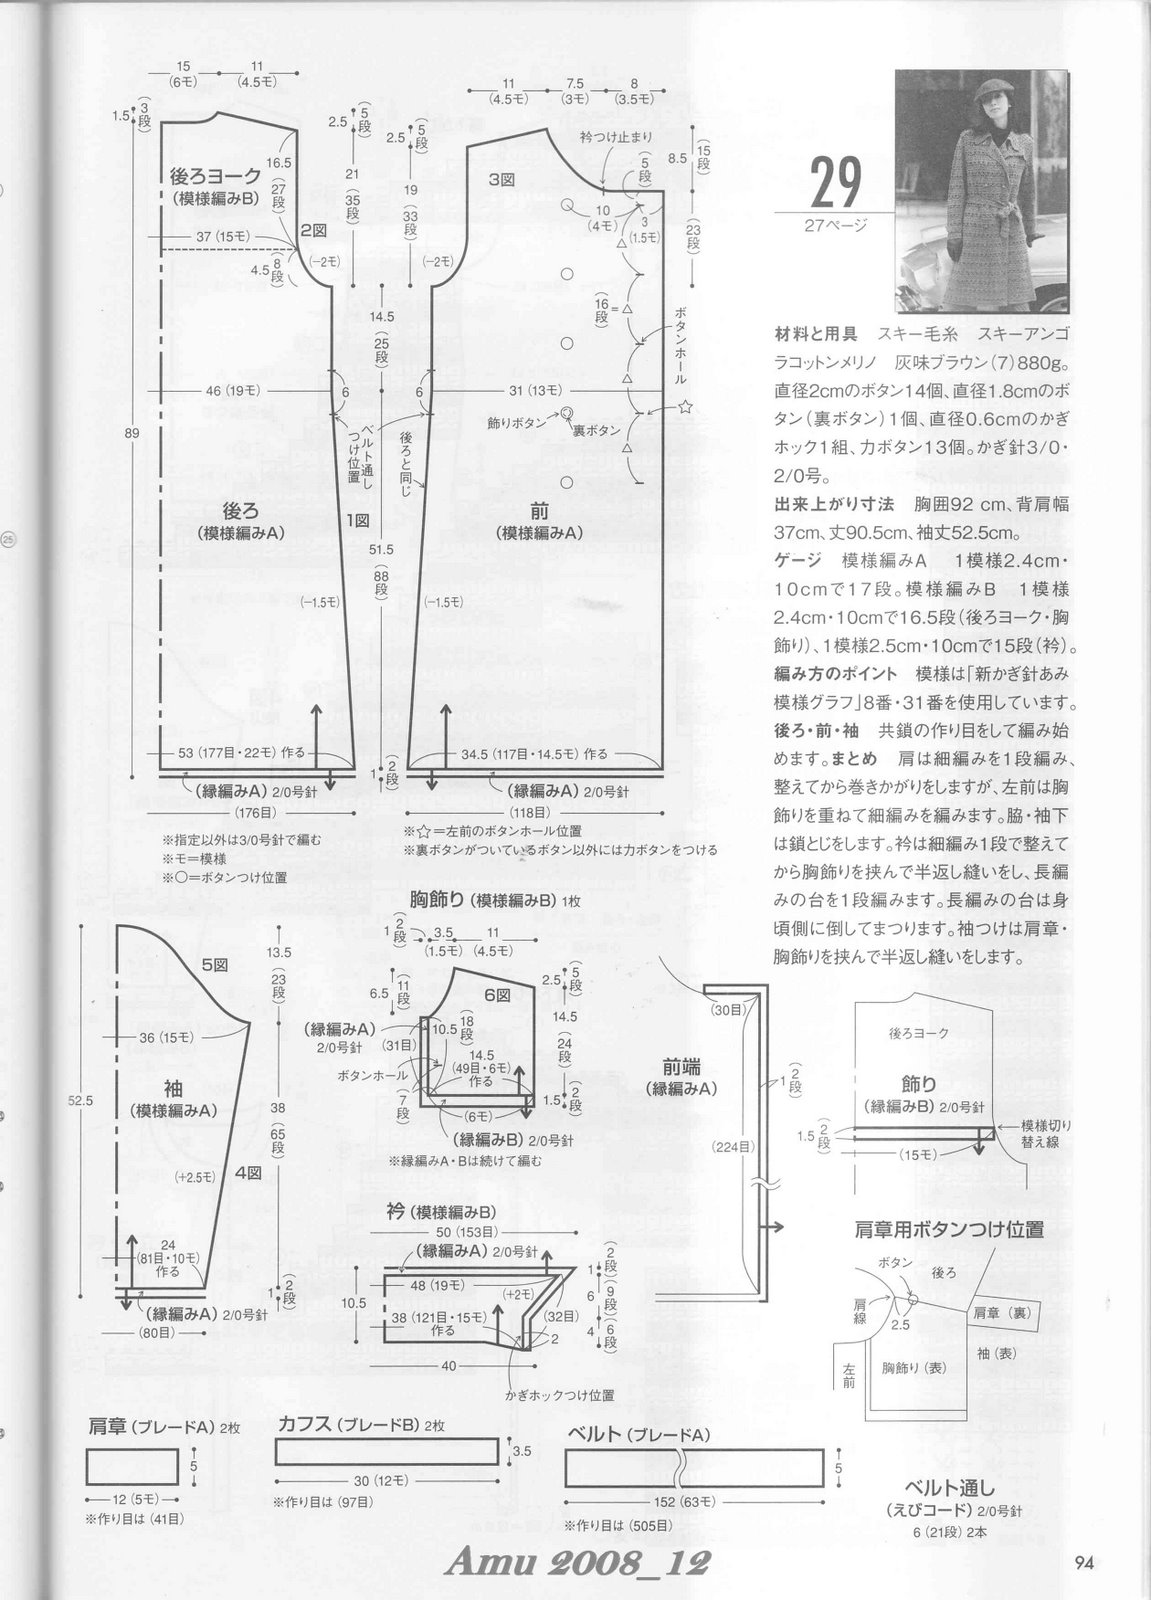 Amu 2008 12 下  - 荷塘秀色 - 茶之韵